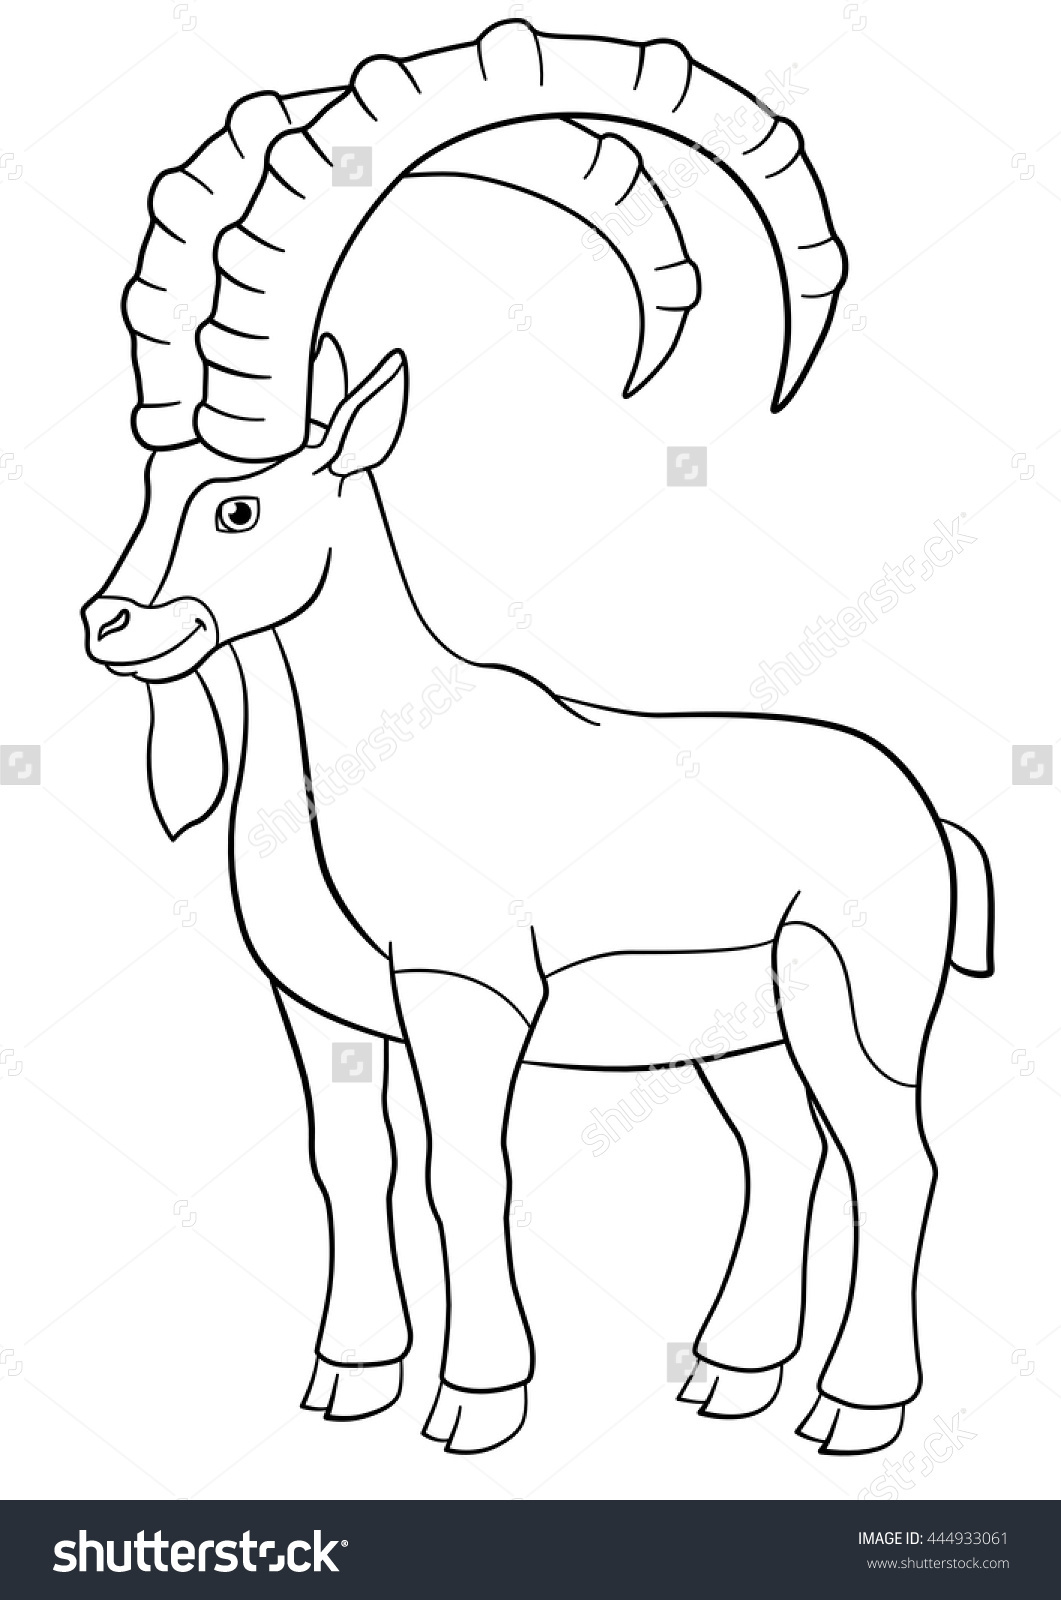 Ibex coloring #12, Download drawings